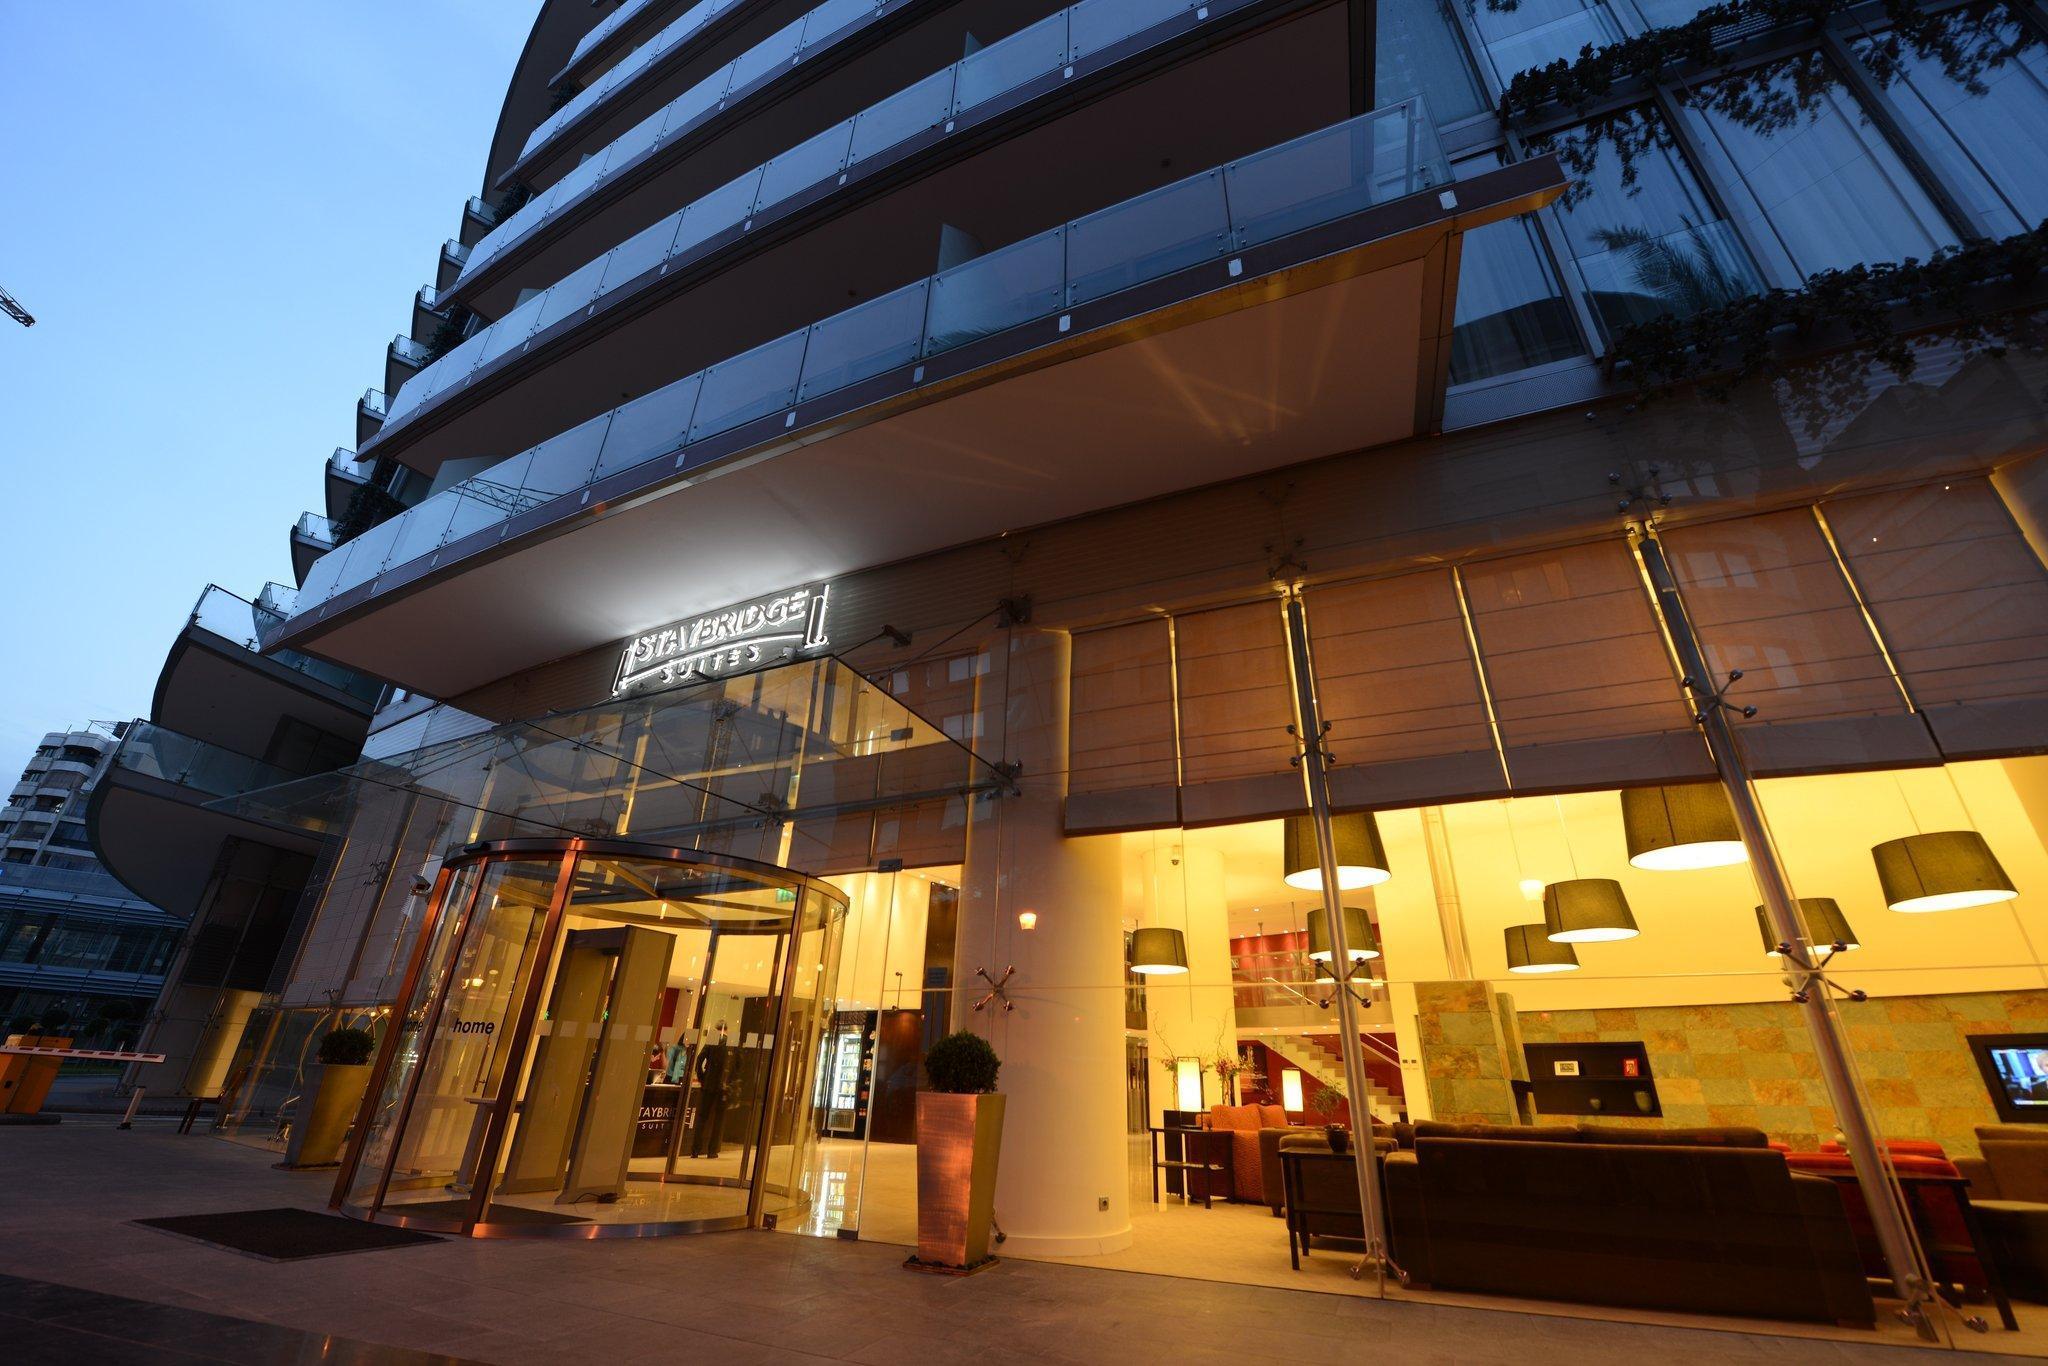 Staybridge Suites & Apartments - Beirut